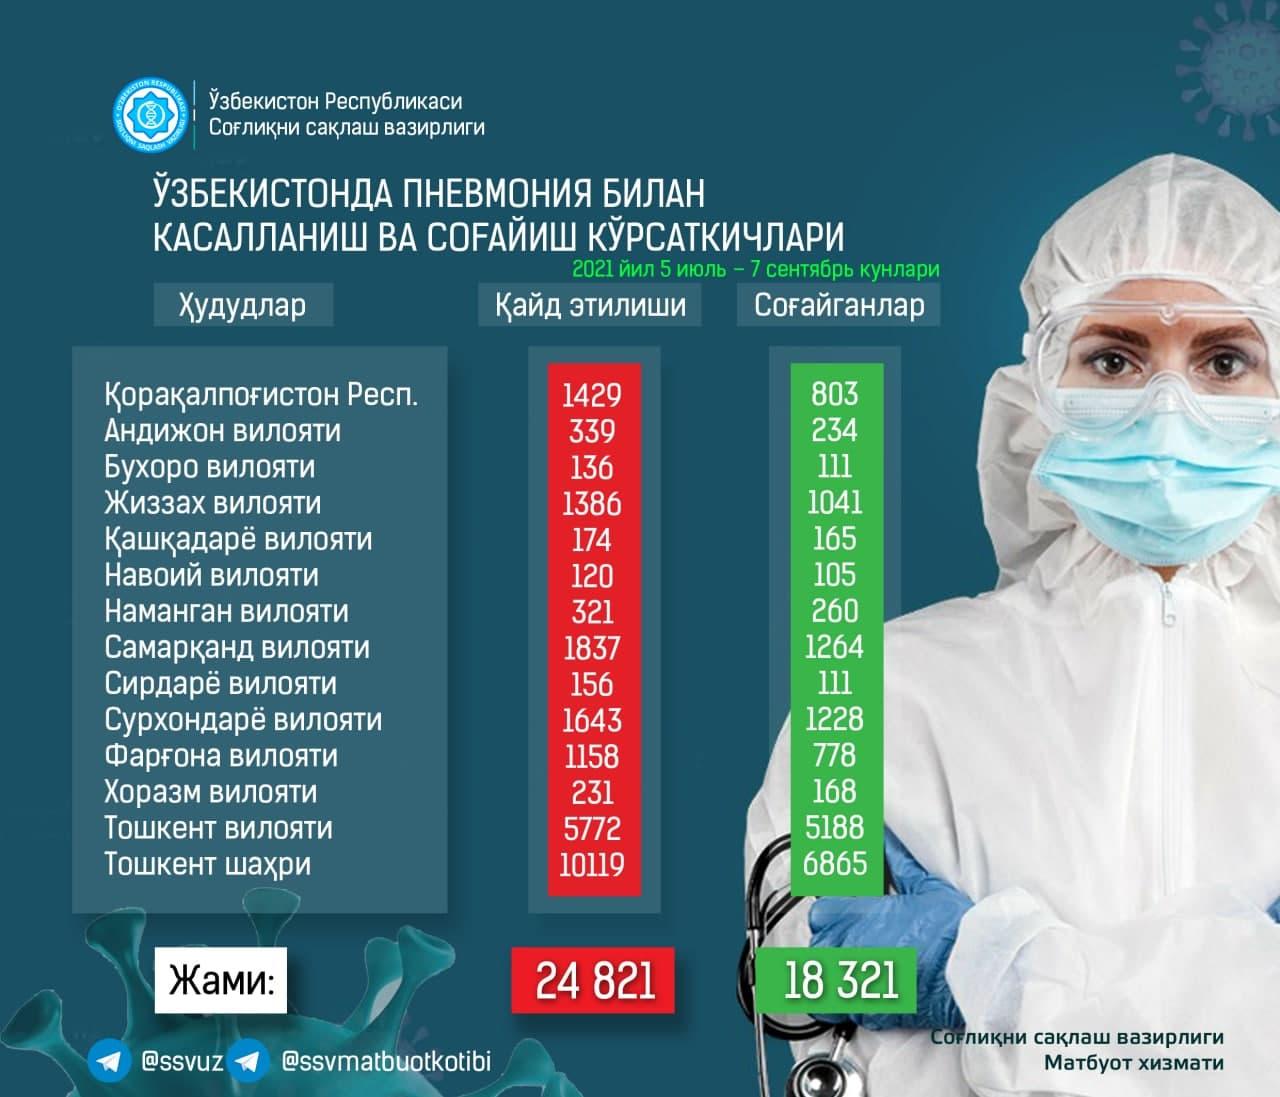 Минздрав опубликовал обновленную статистику по заболевшим пневмонией